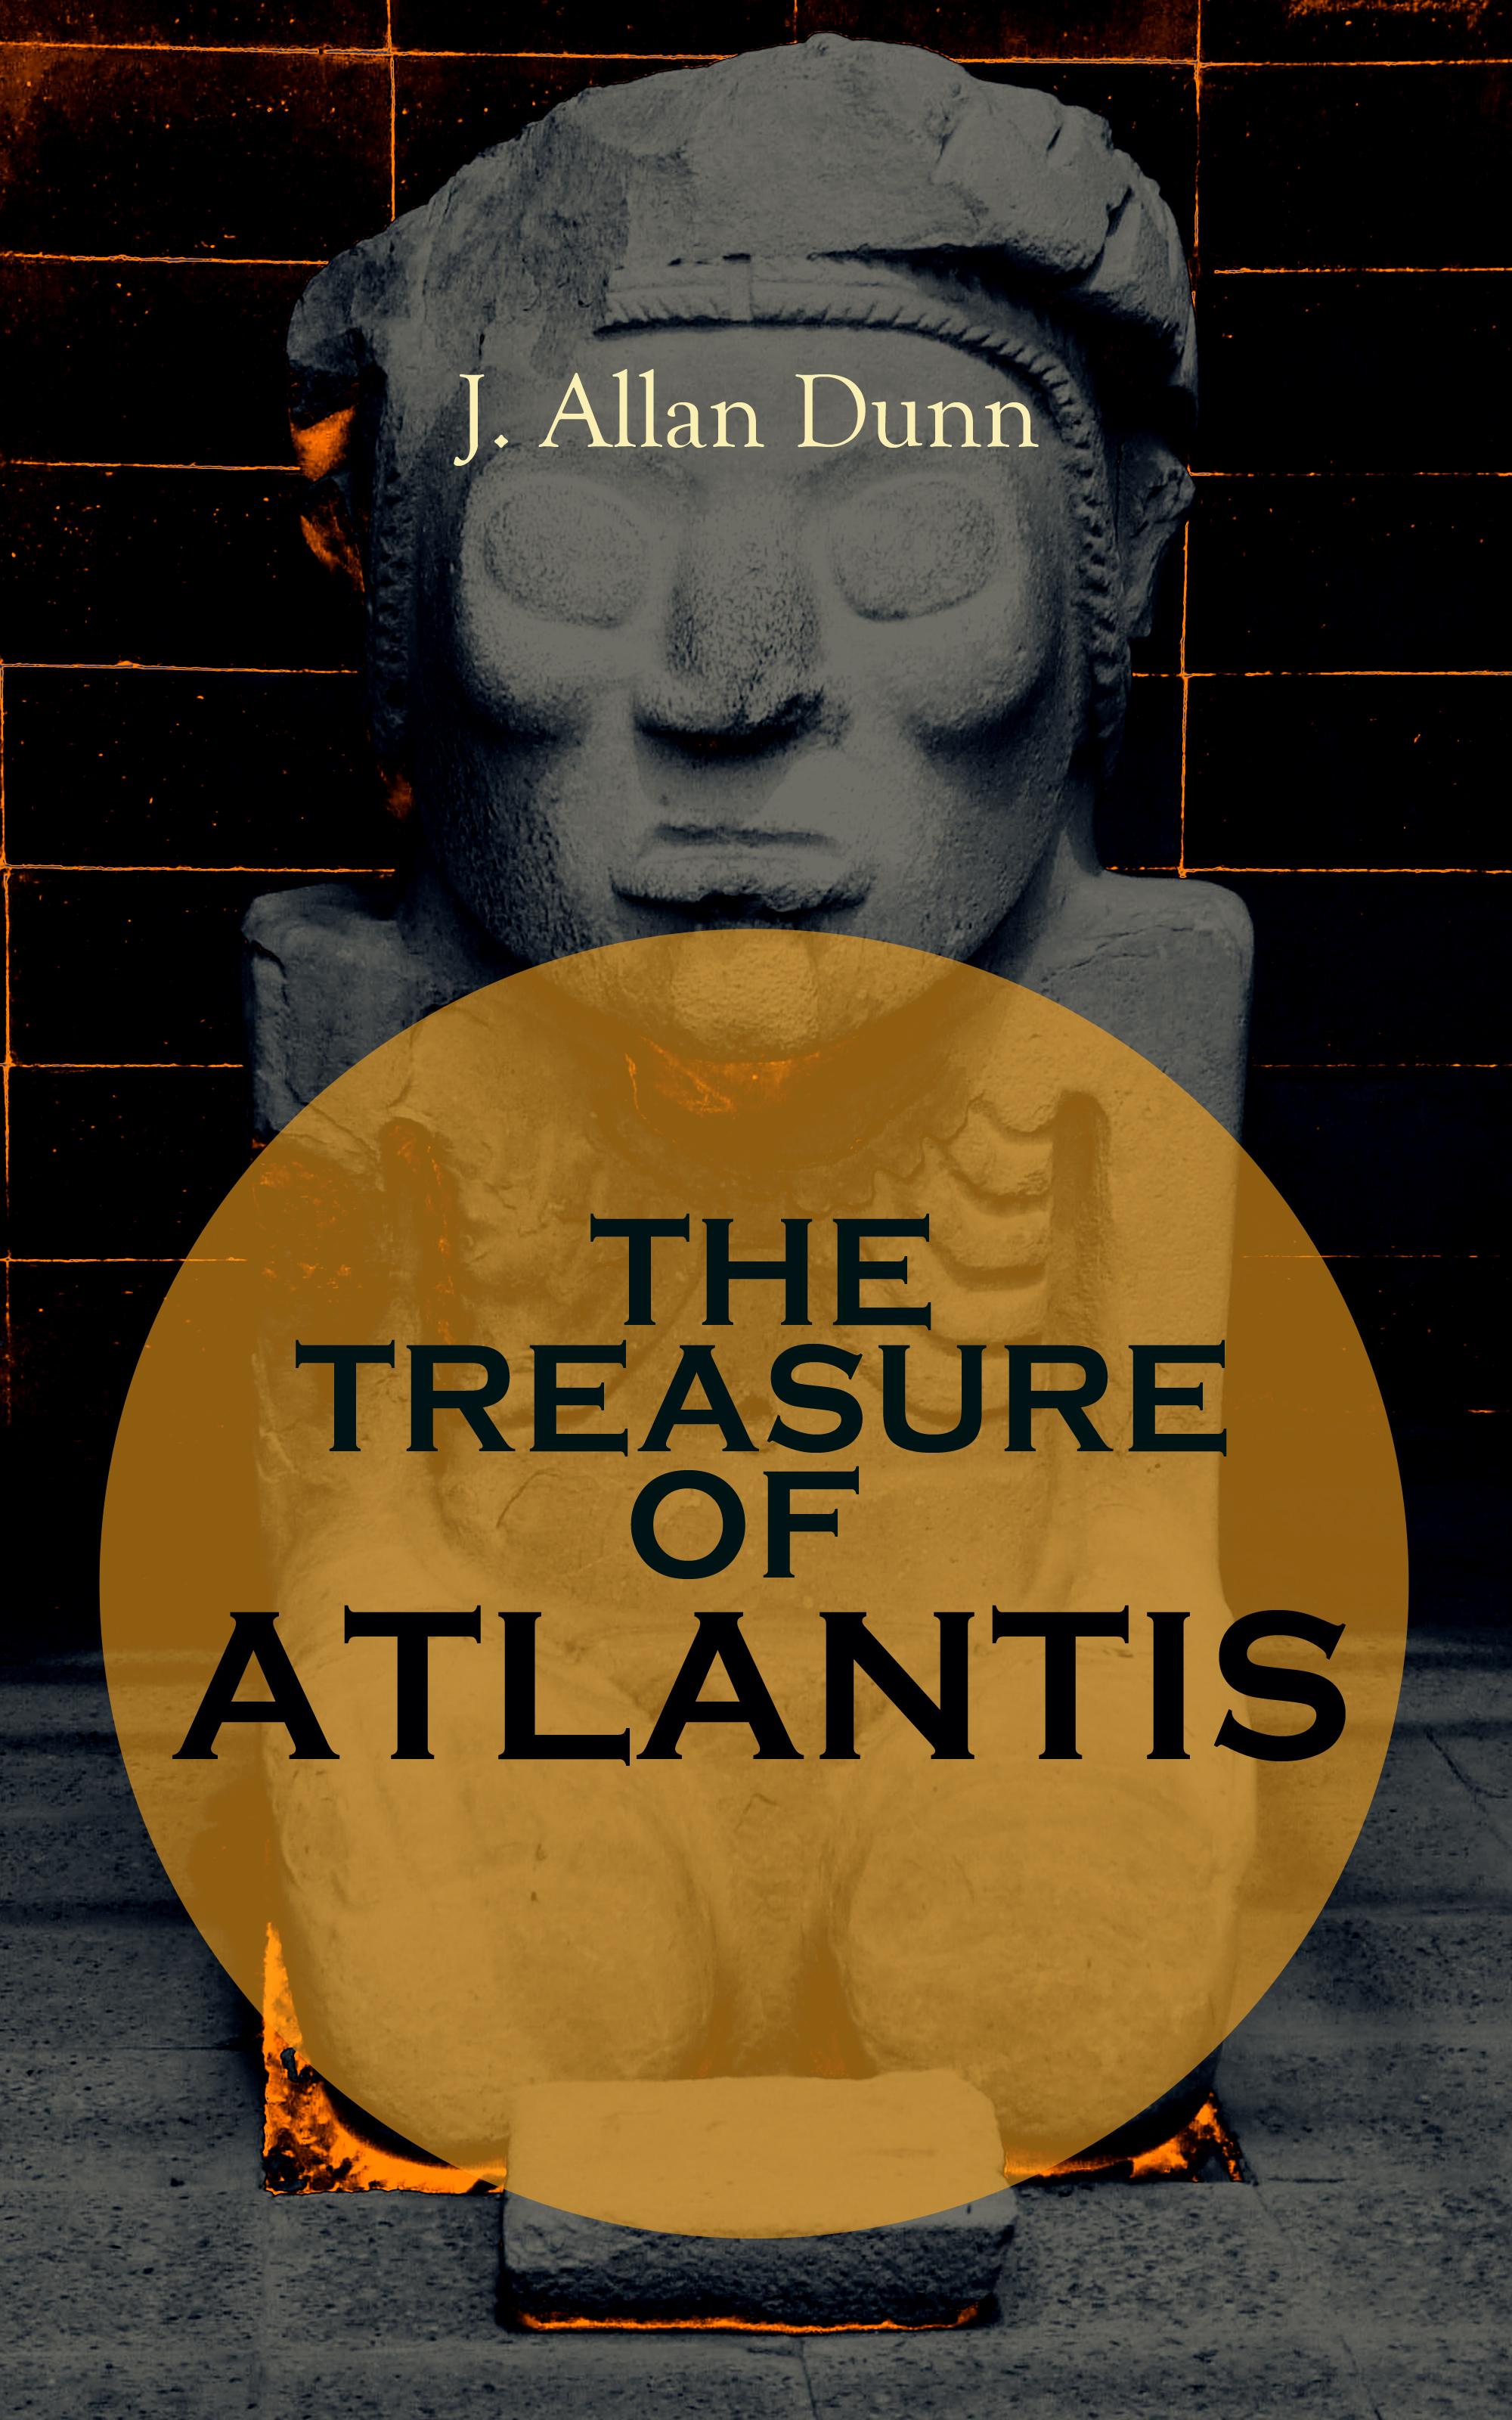 THE TREASURE OF ATLANTIS ( J. Allan Dunn  )